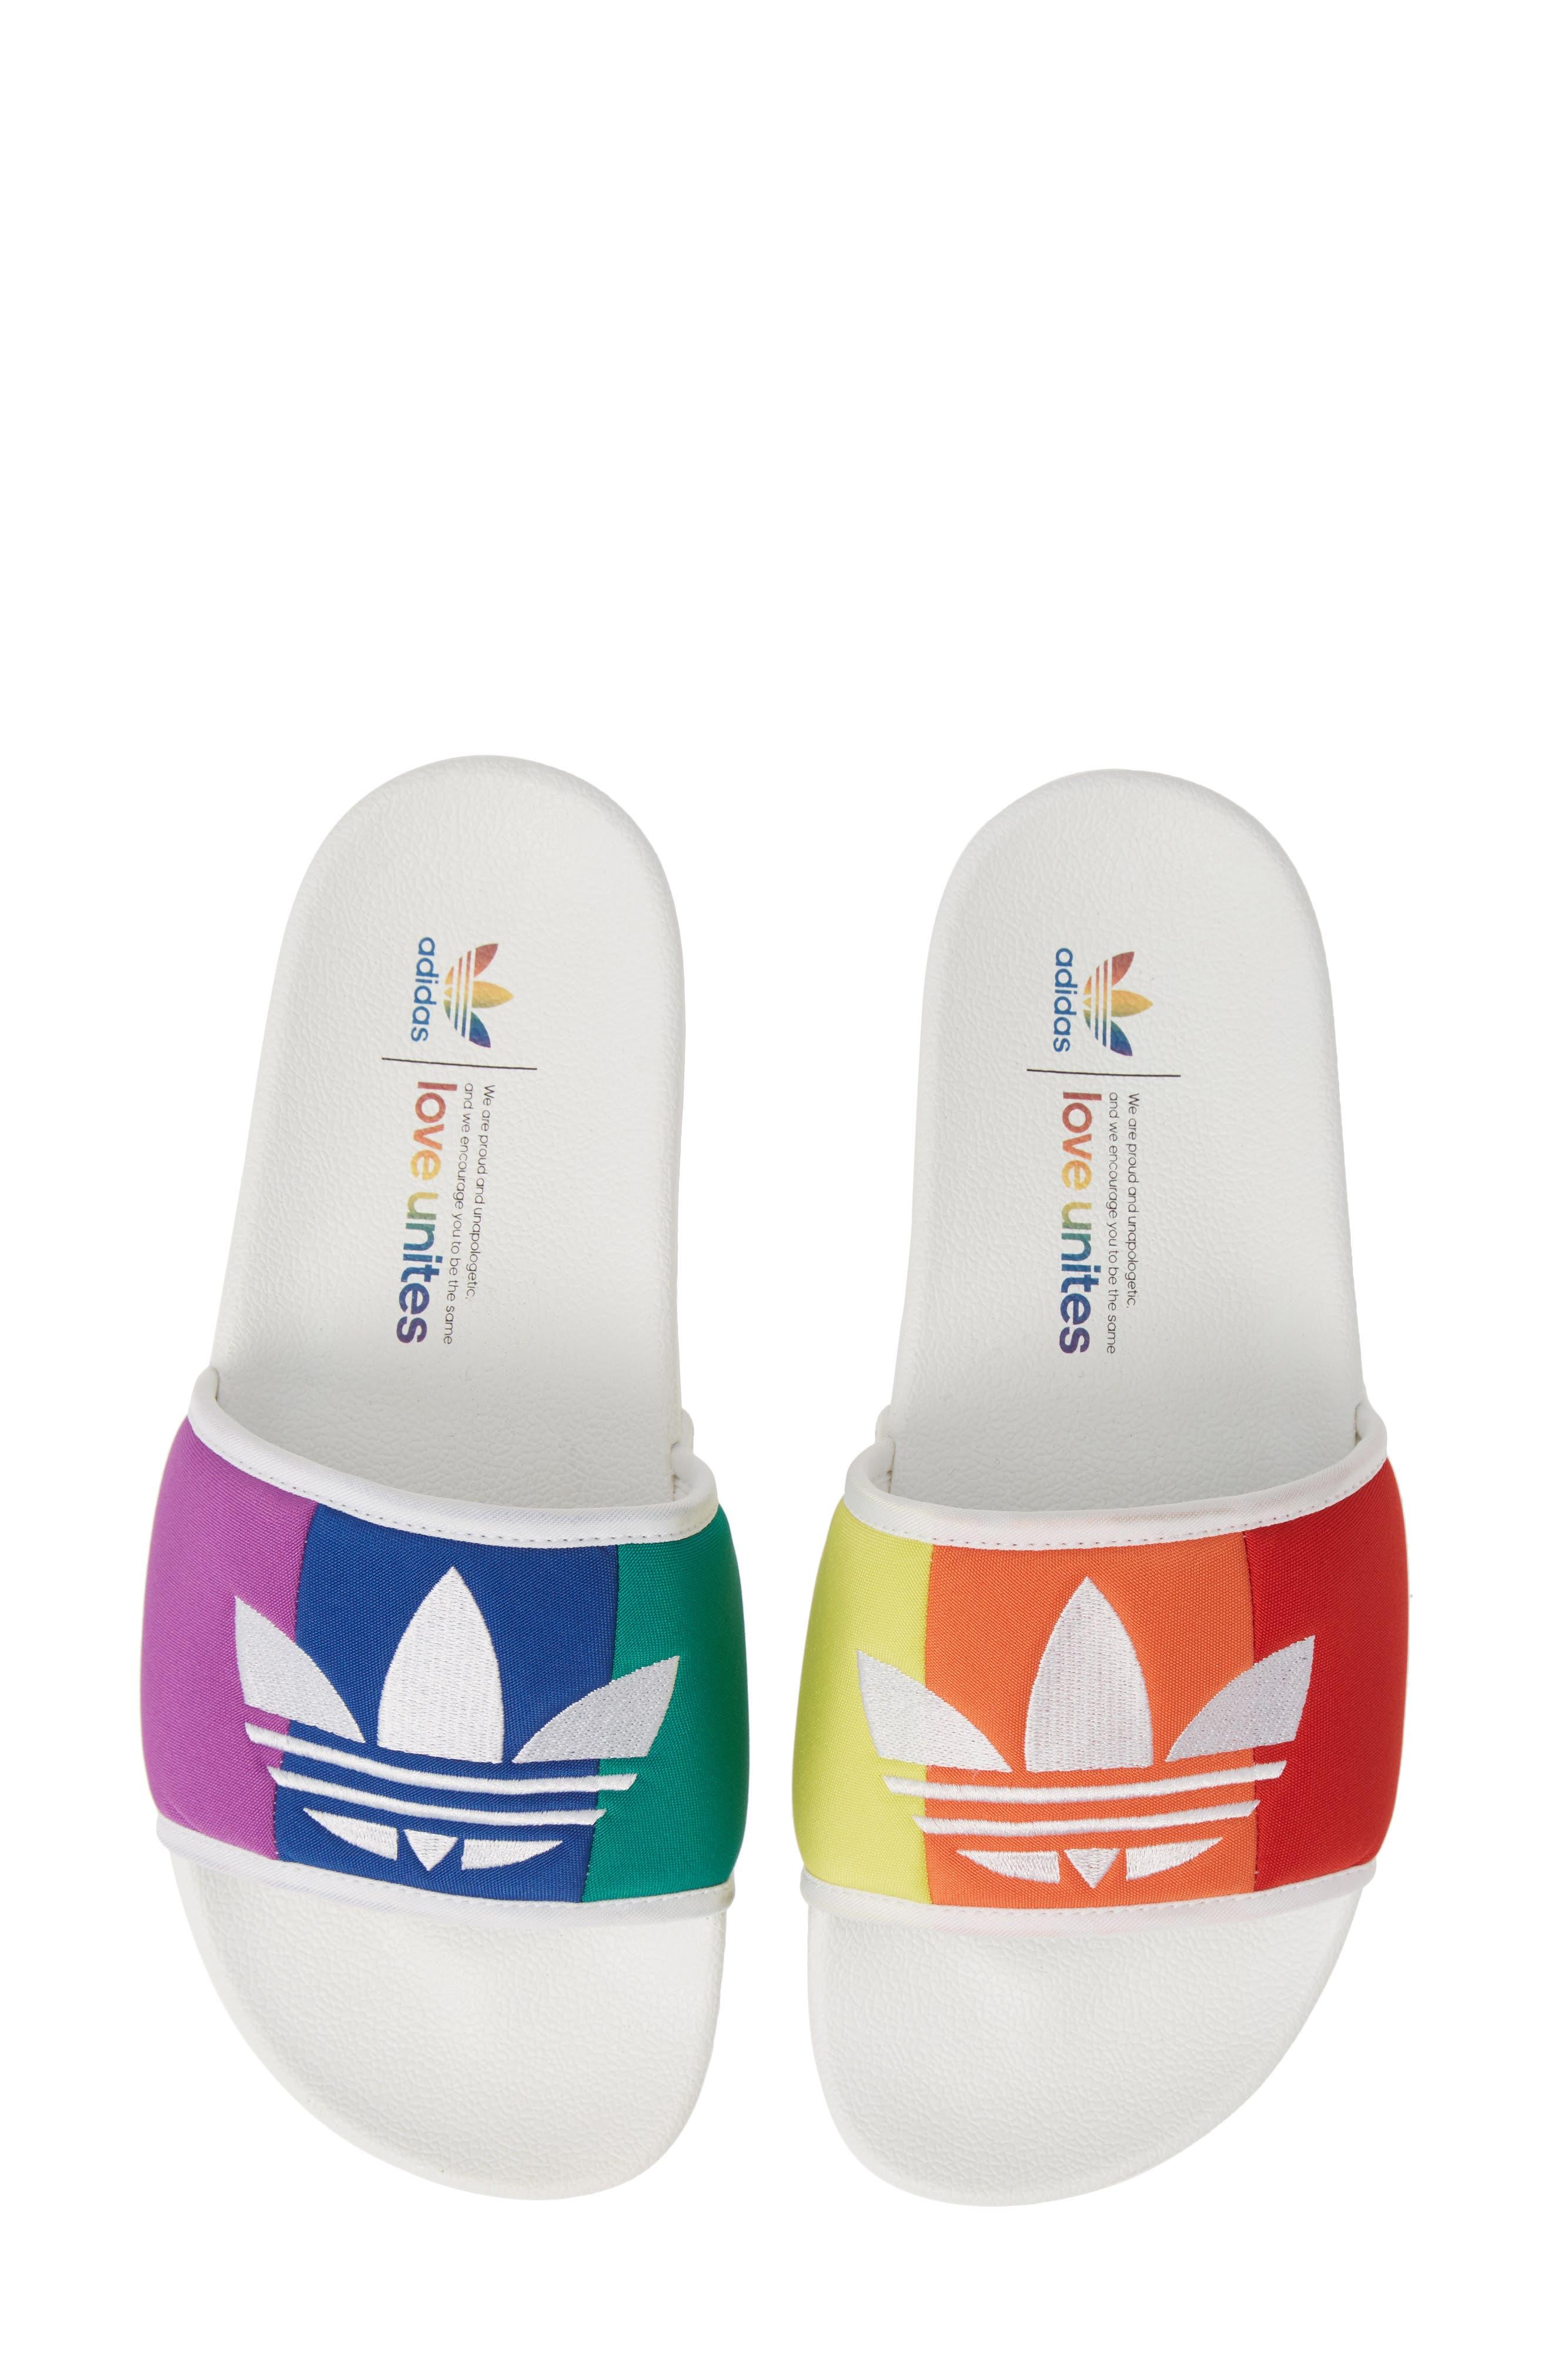 Adidas Adilette Pride Sport Slide, / 11 Men